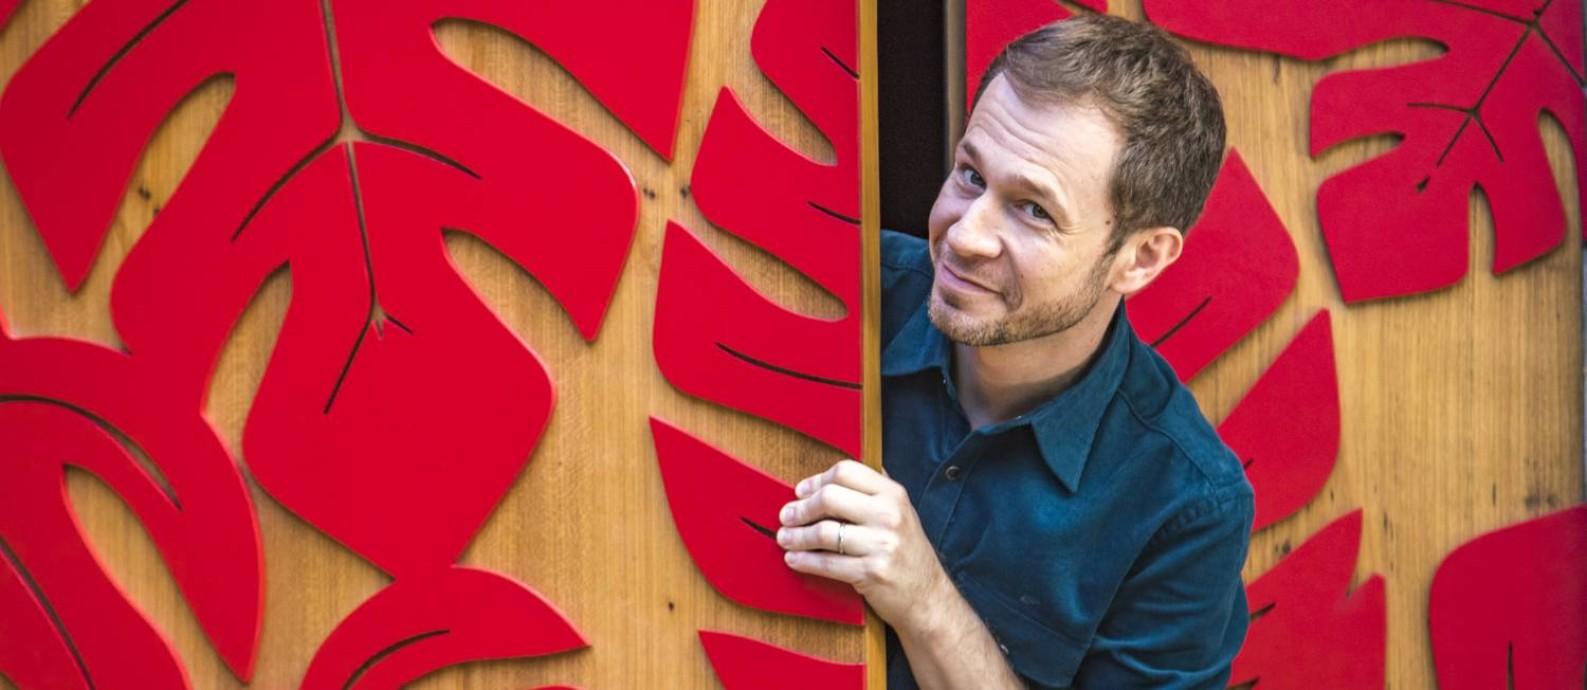 Tiago Leifert Foto: Divulgação/TV Globo/Paulo Belote